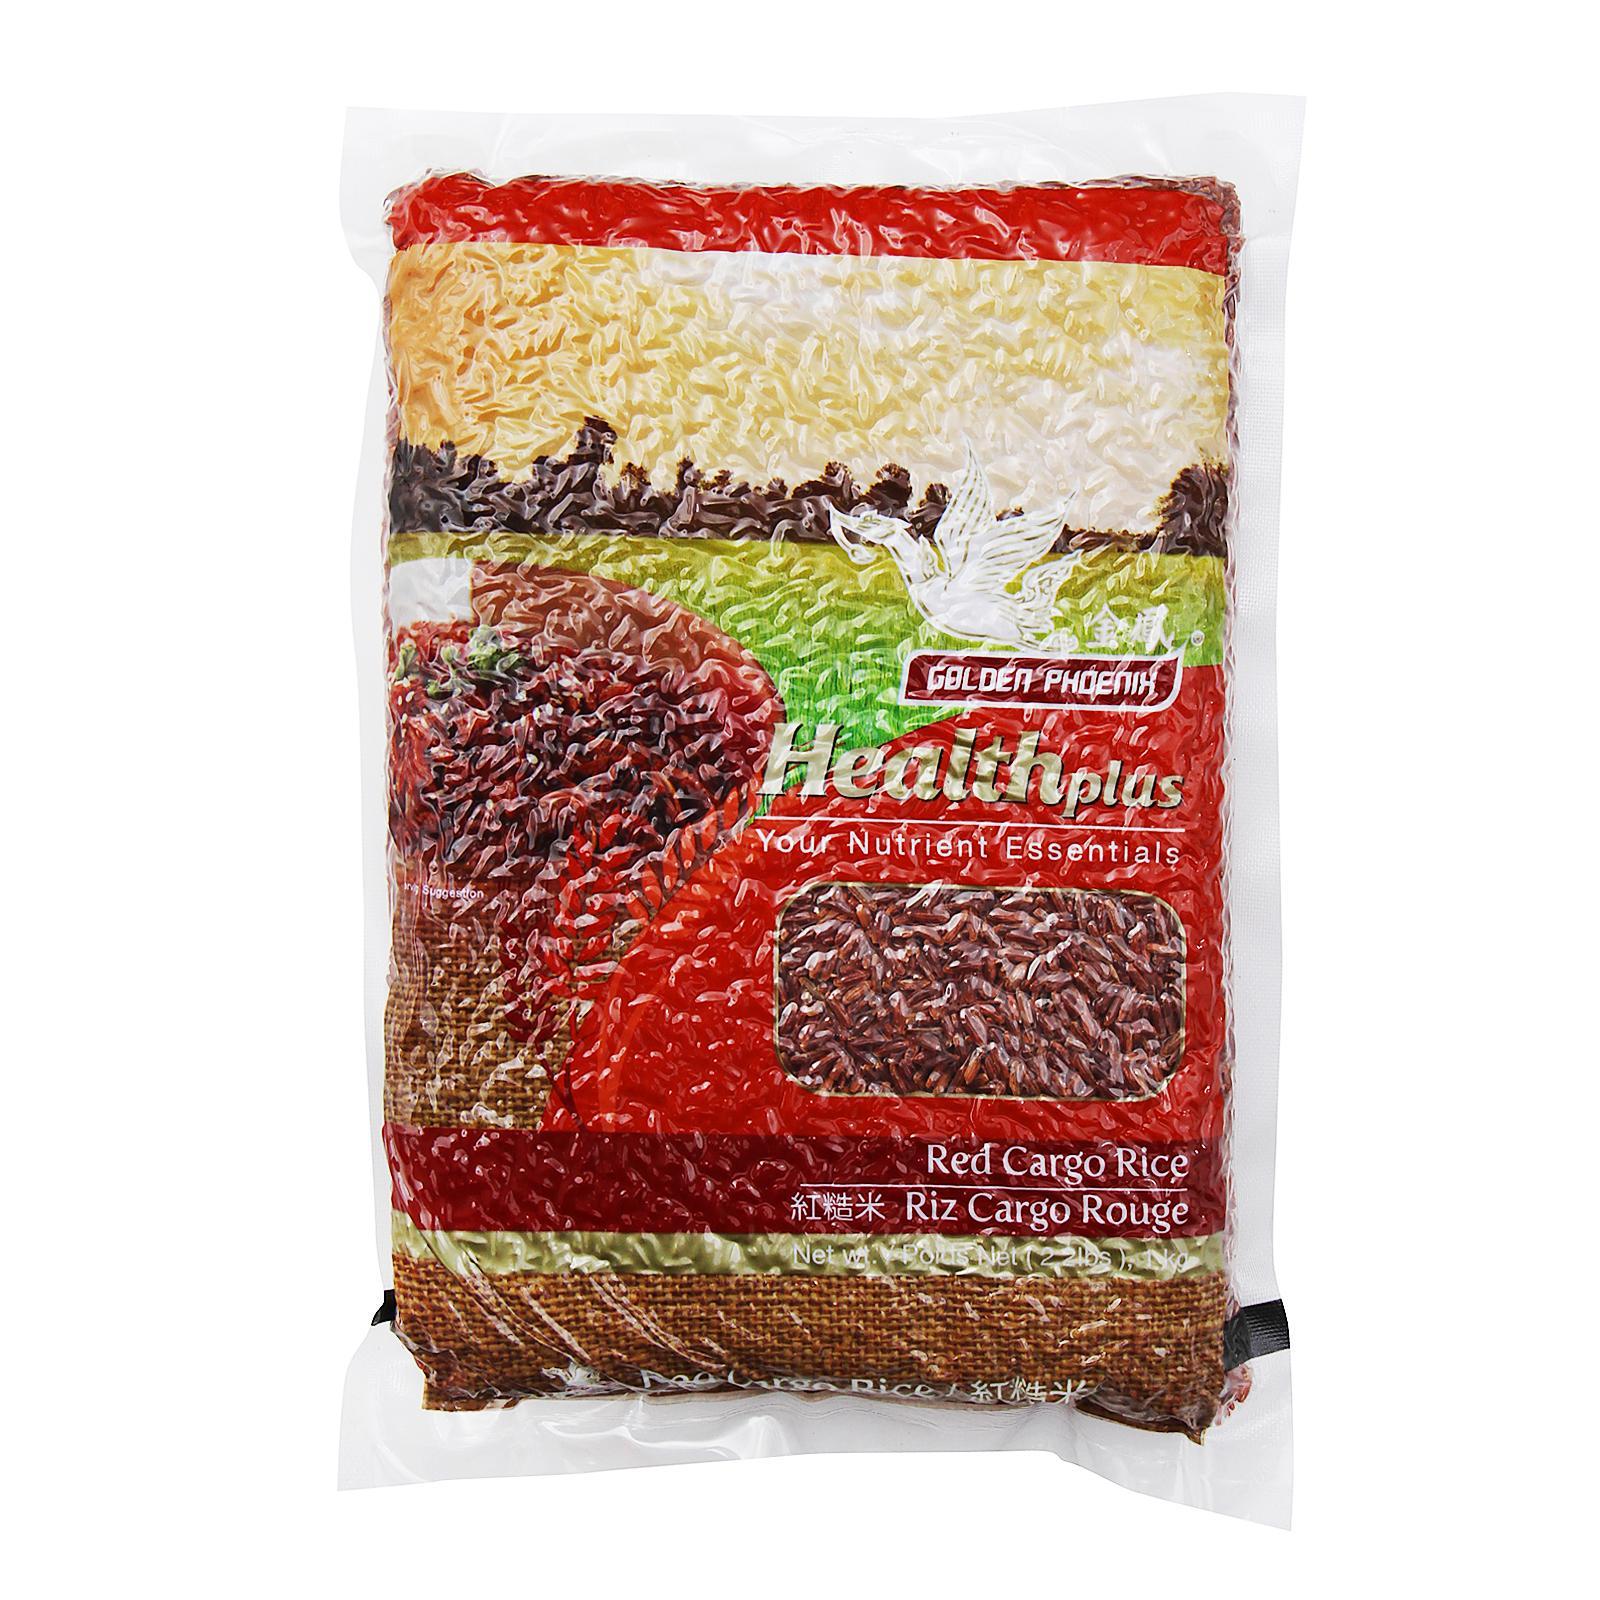 Golden Phoenix Thai Hom Mali Rice